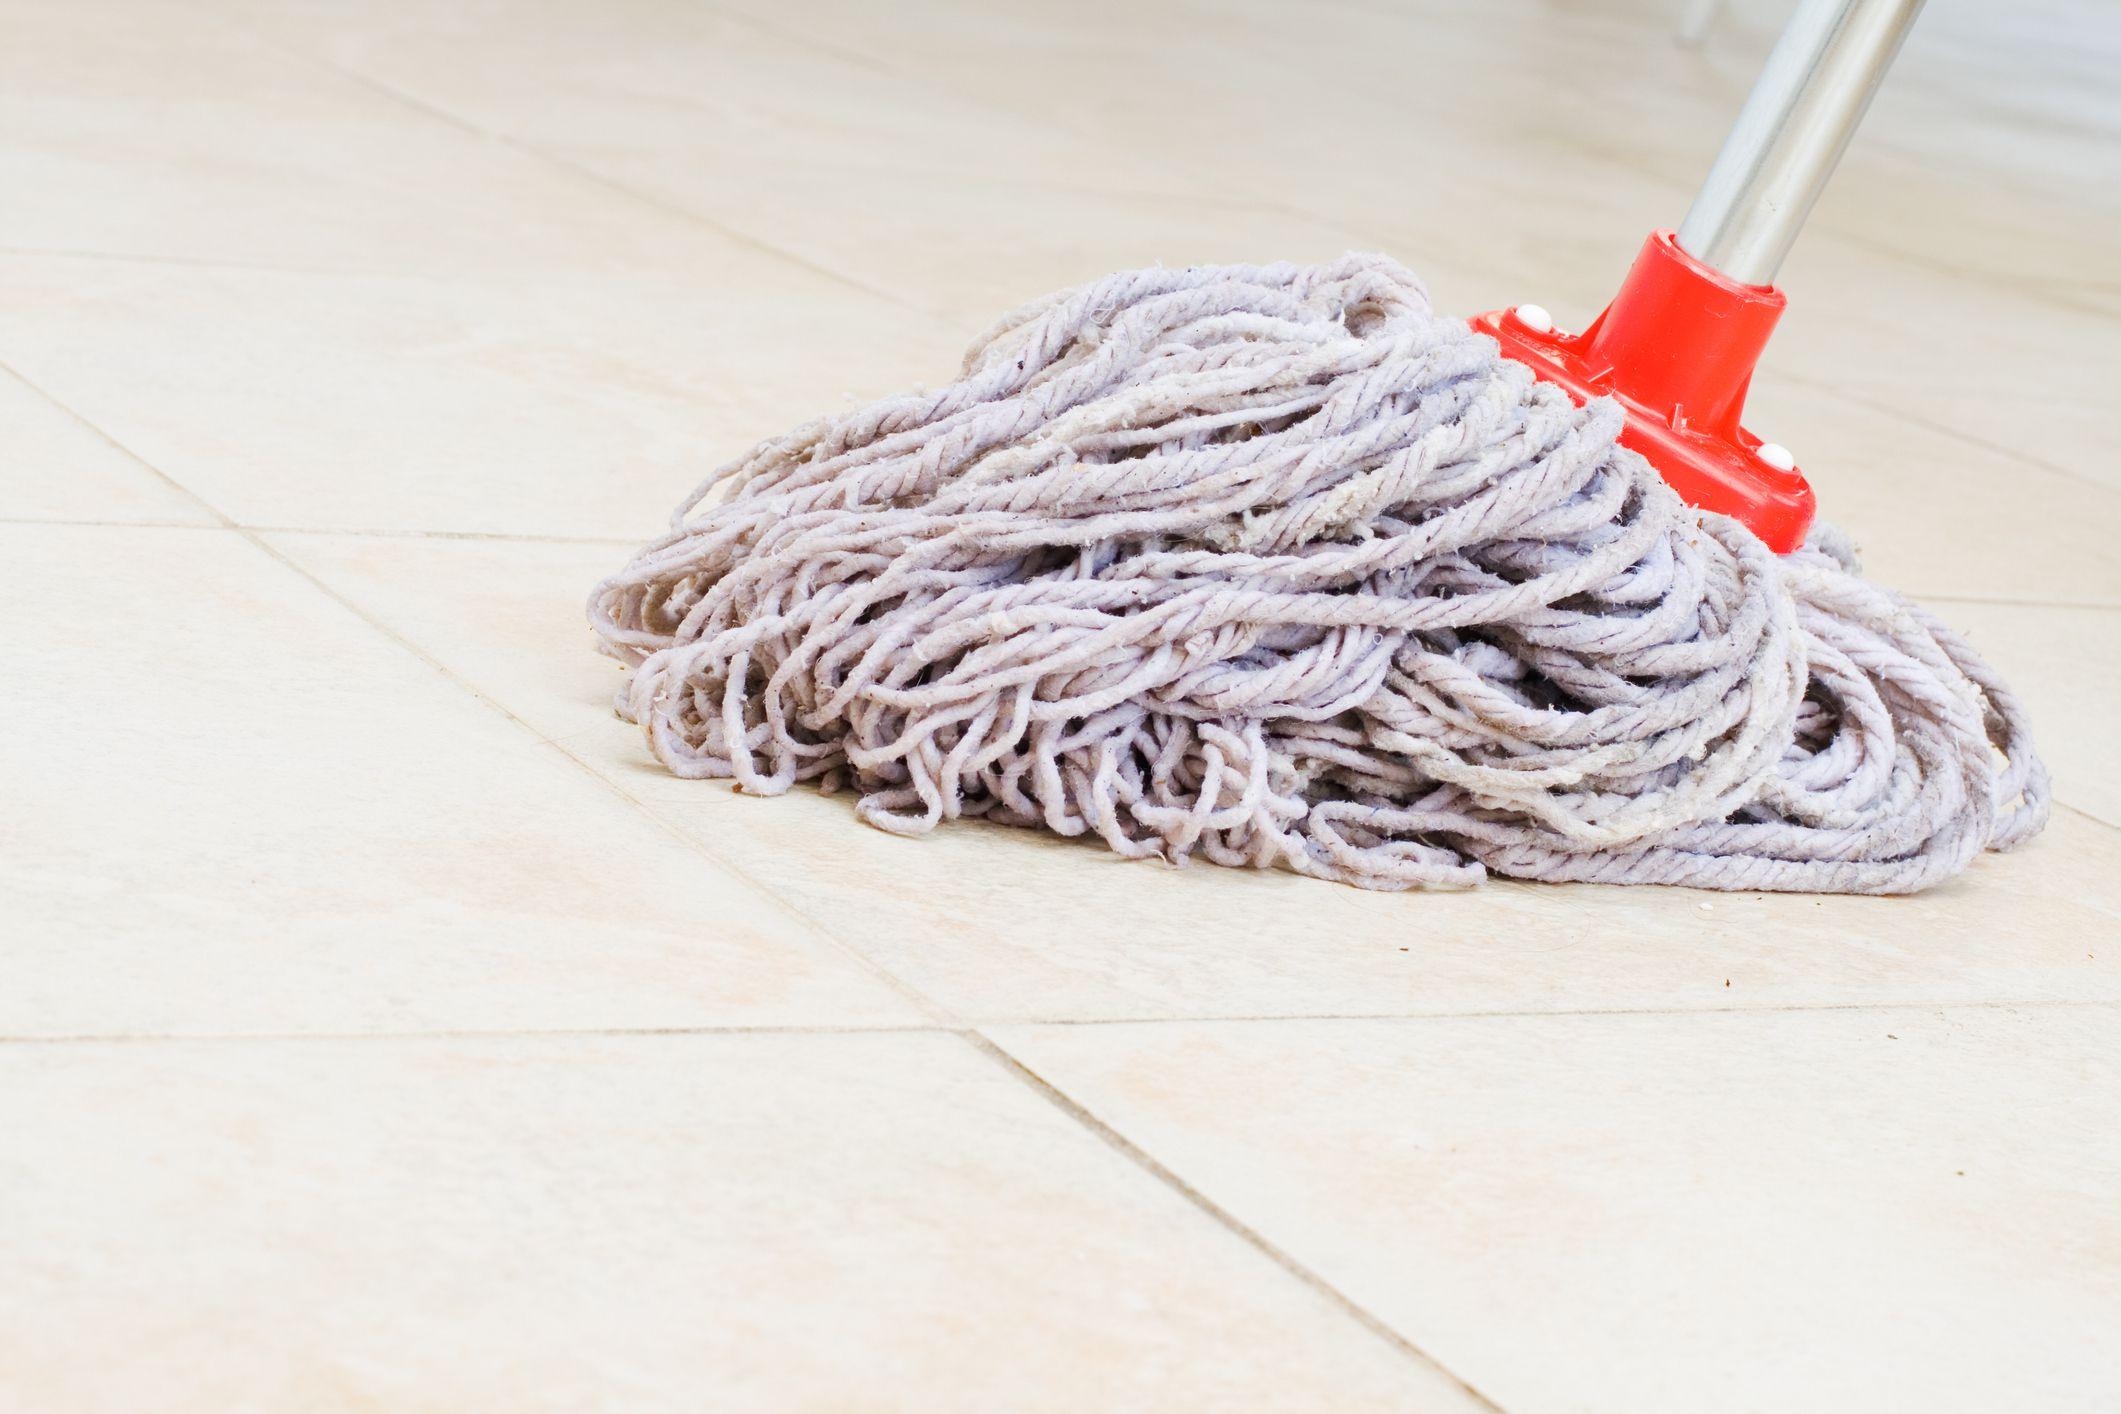 Keep Your Mop Sanitary